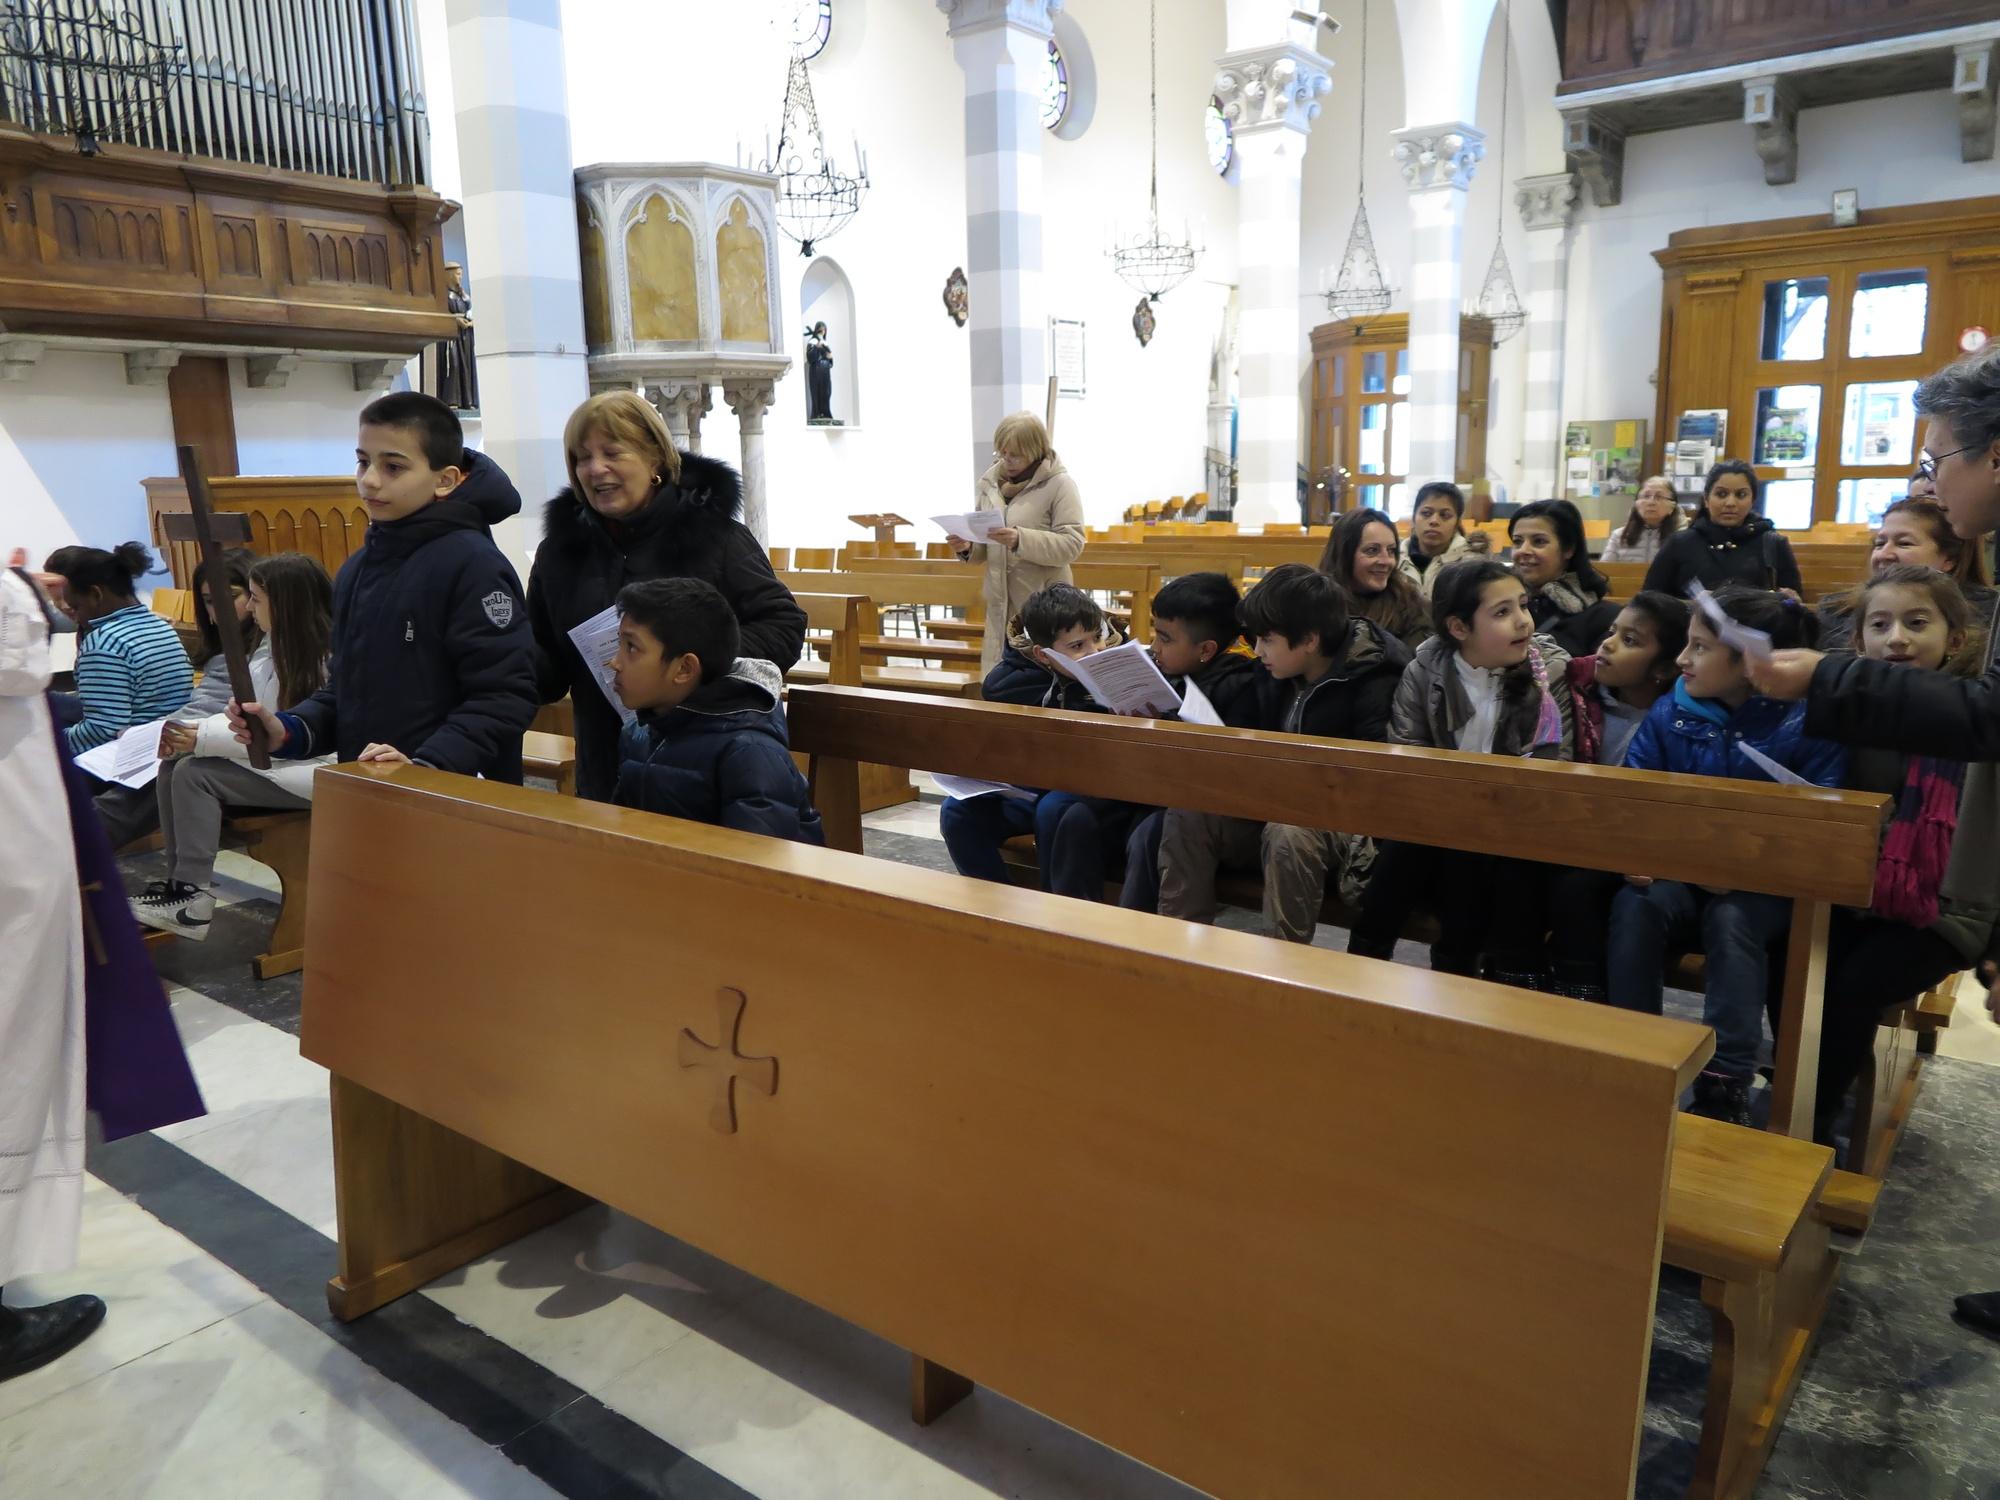 via-crucis-catechismo-2016-03-17-17-01-52